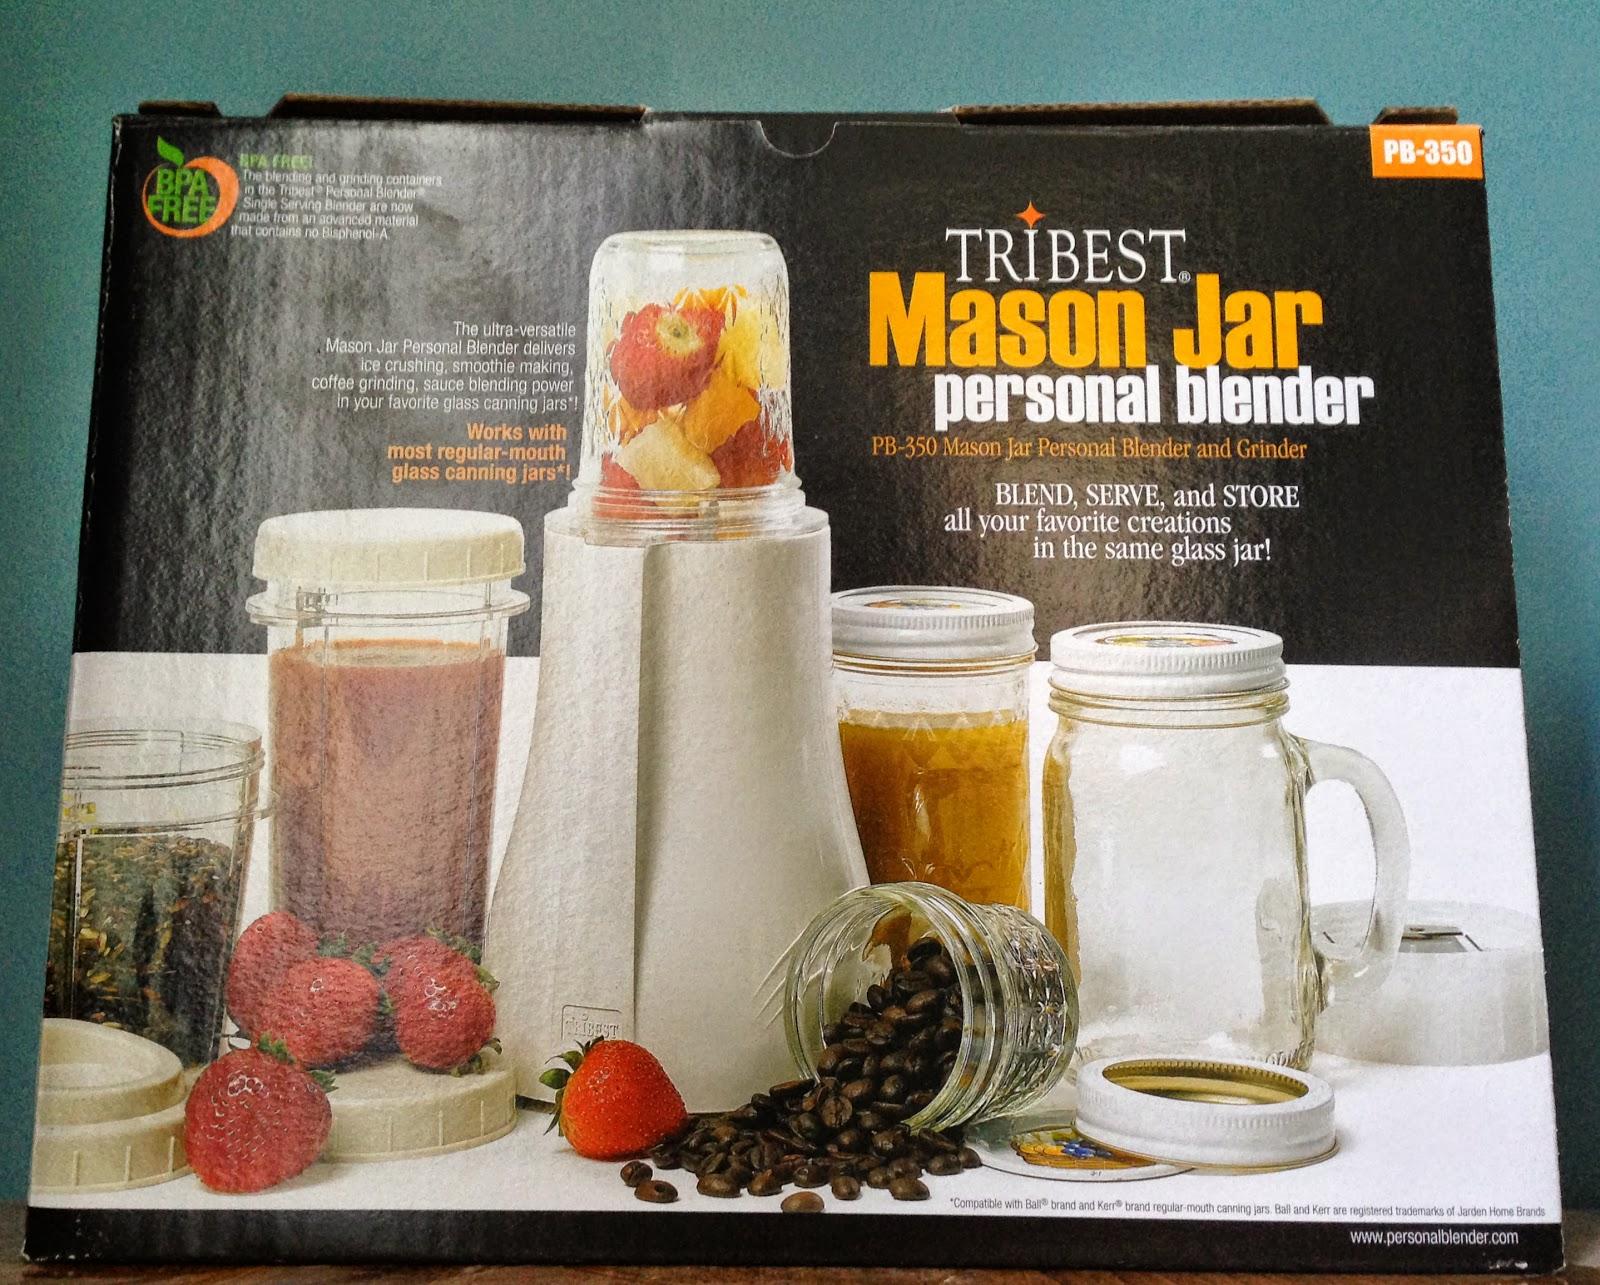 Tribest Personal Mason Jar Blender